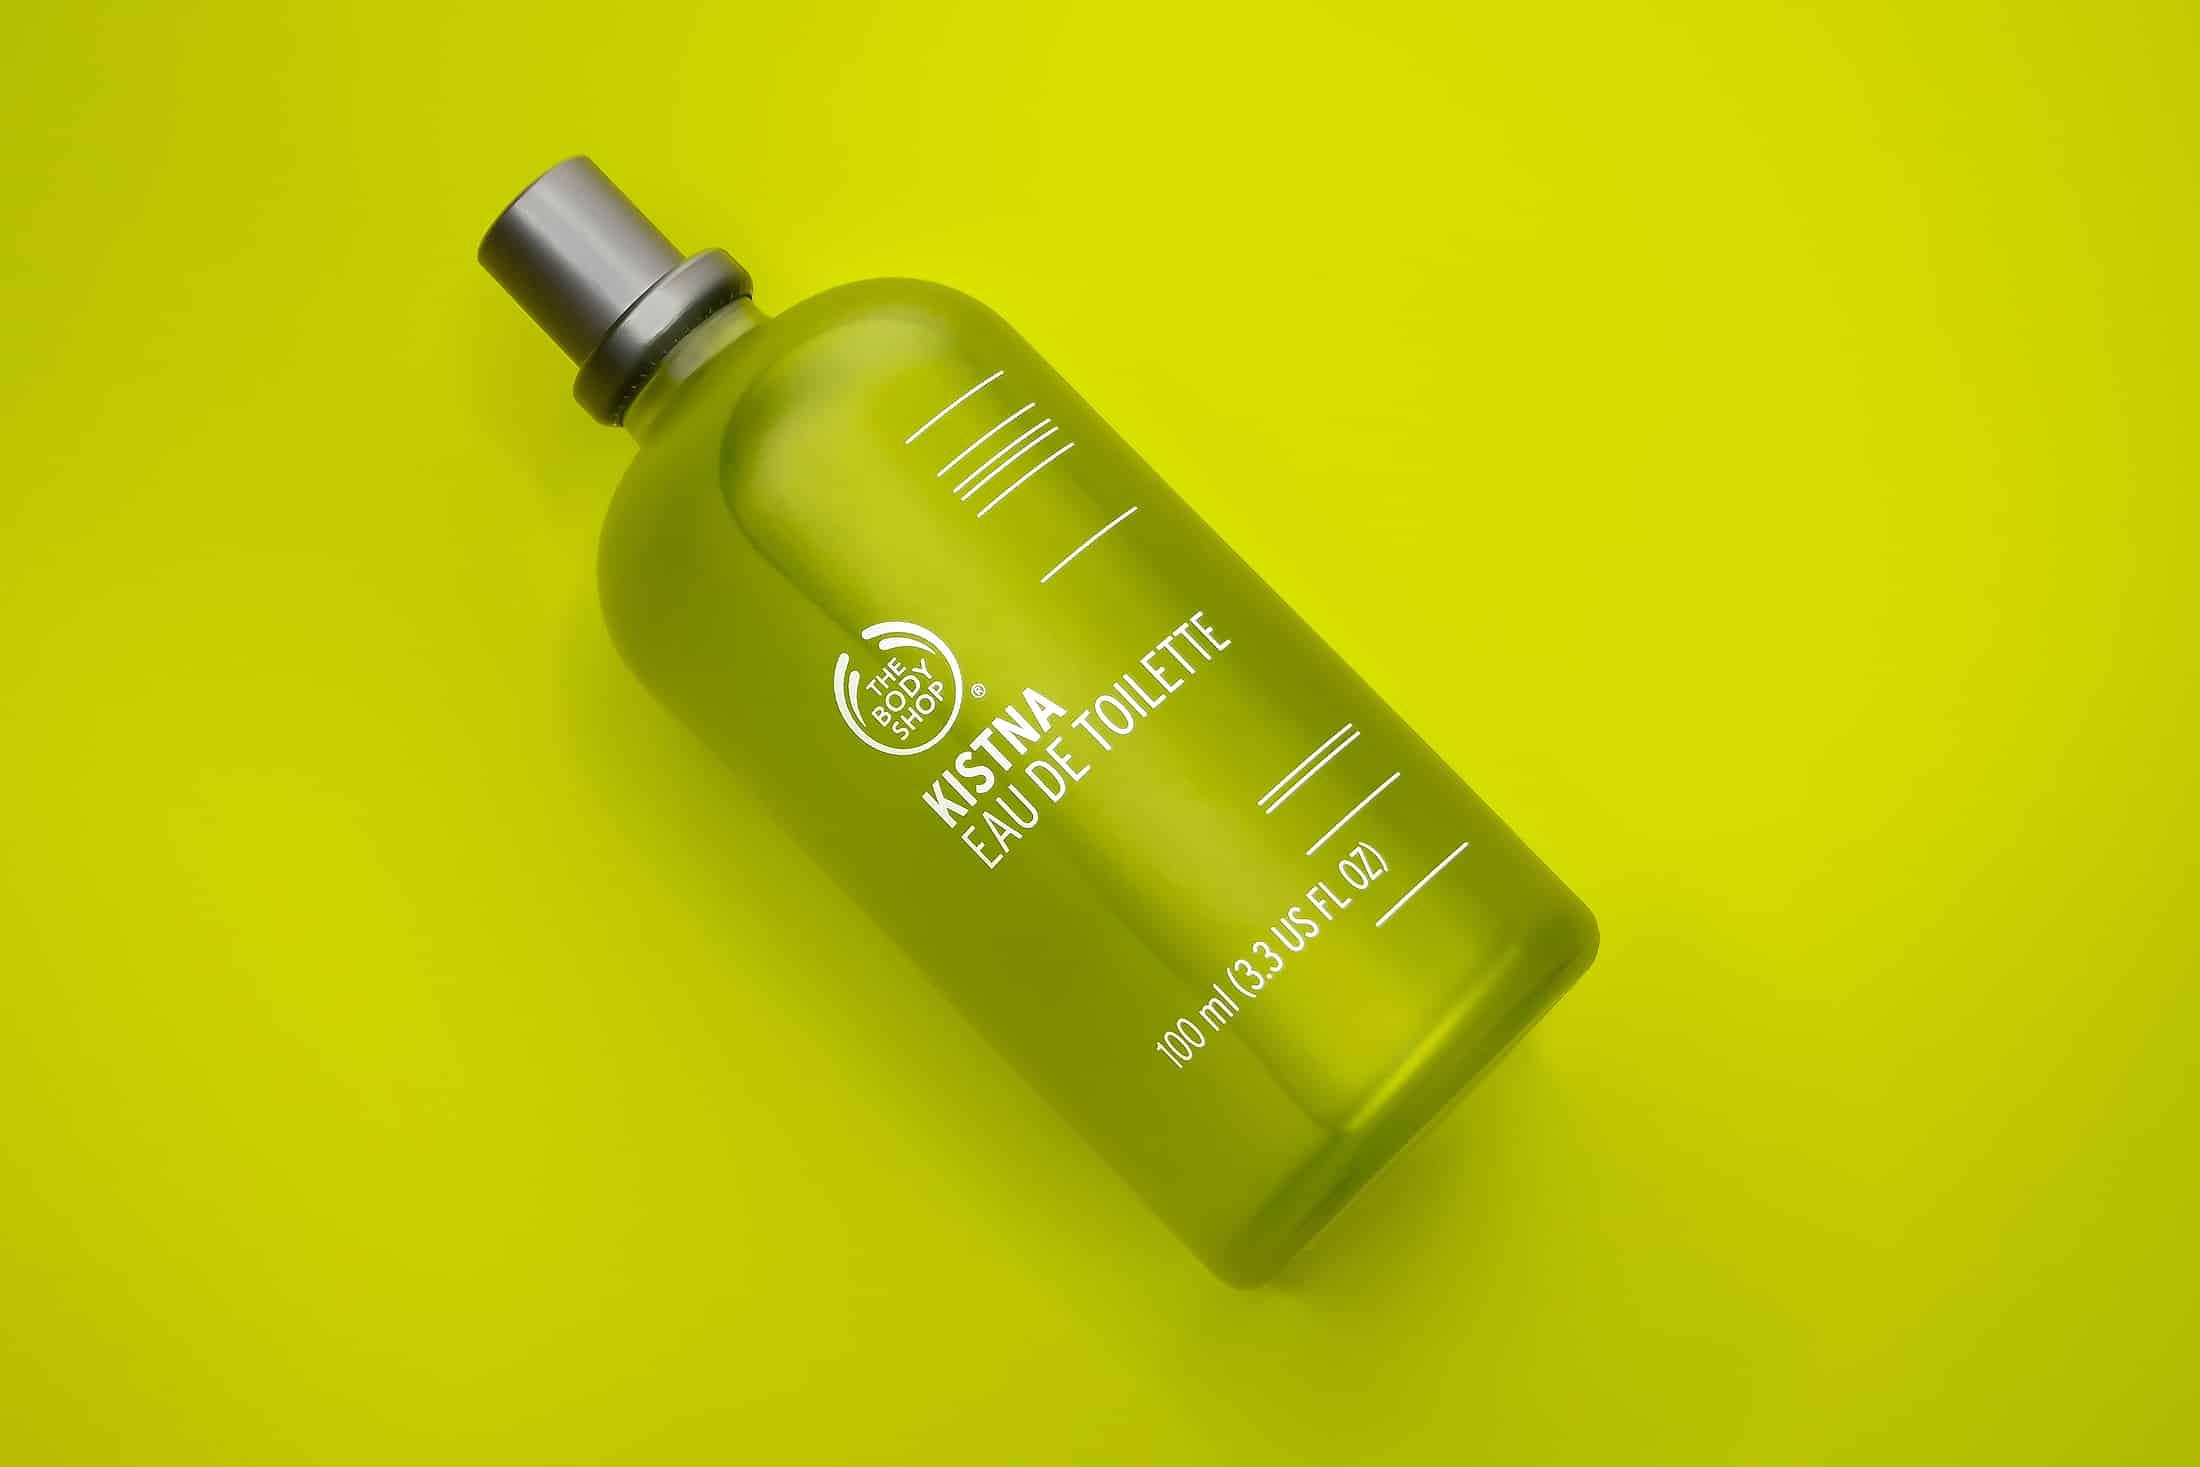 My Favourite Budget Fragrance: The Body Shop Kistna